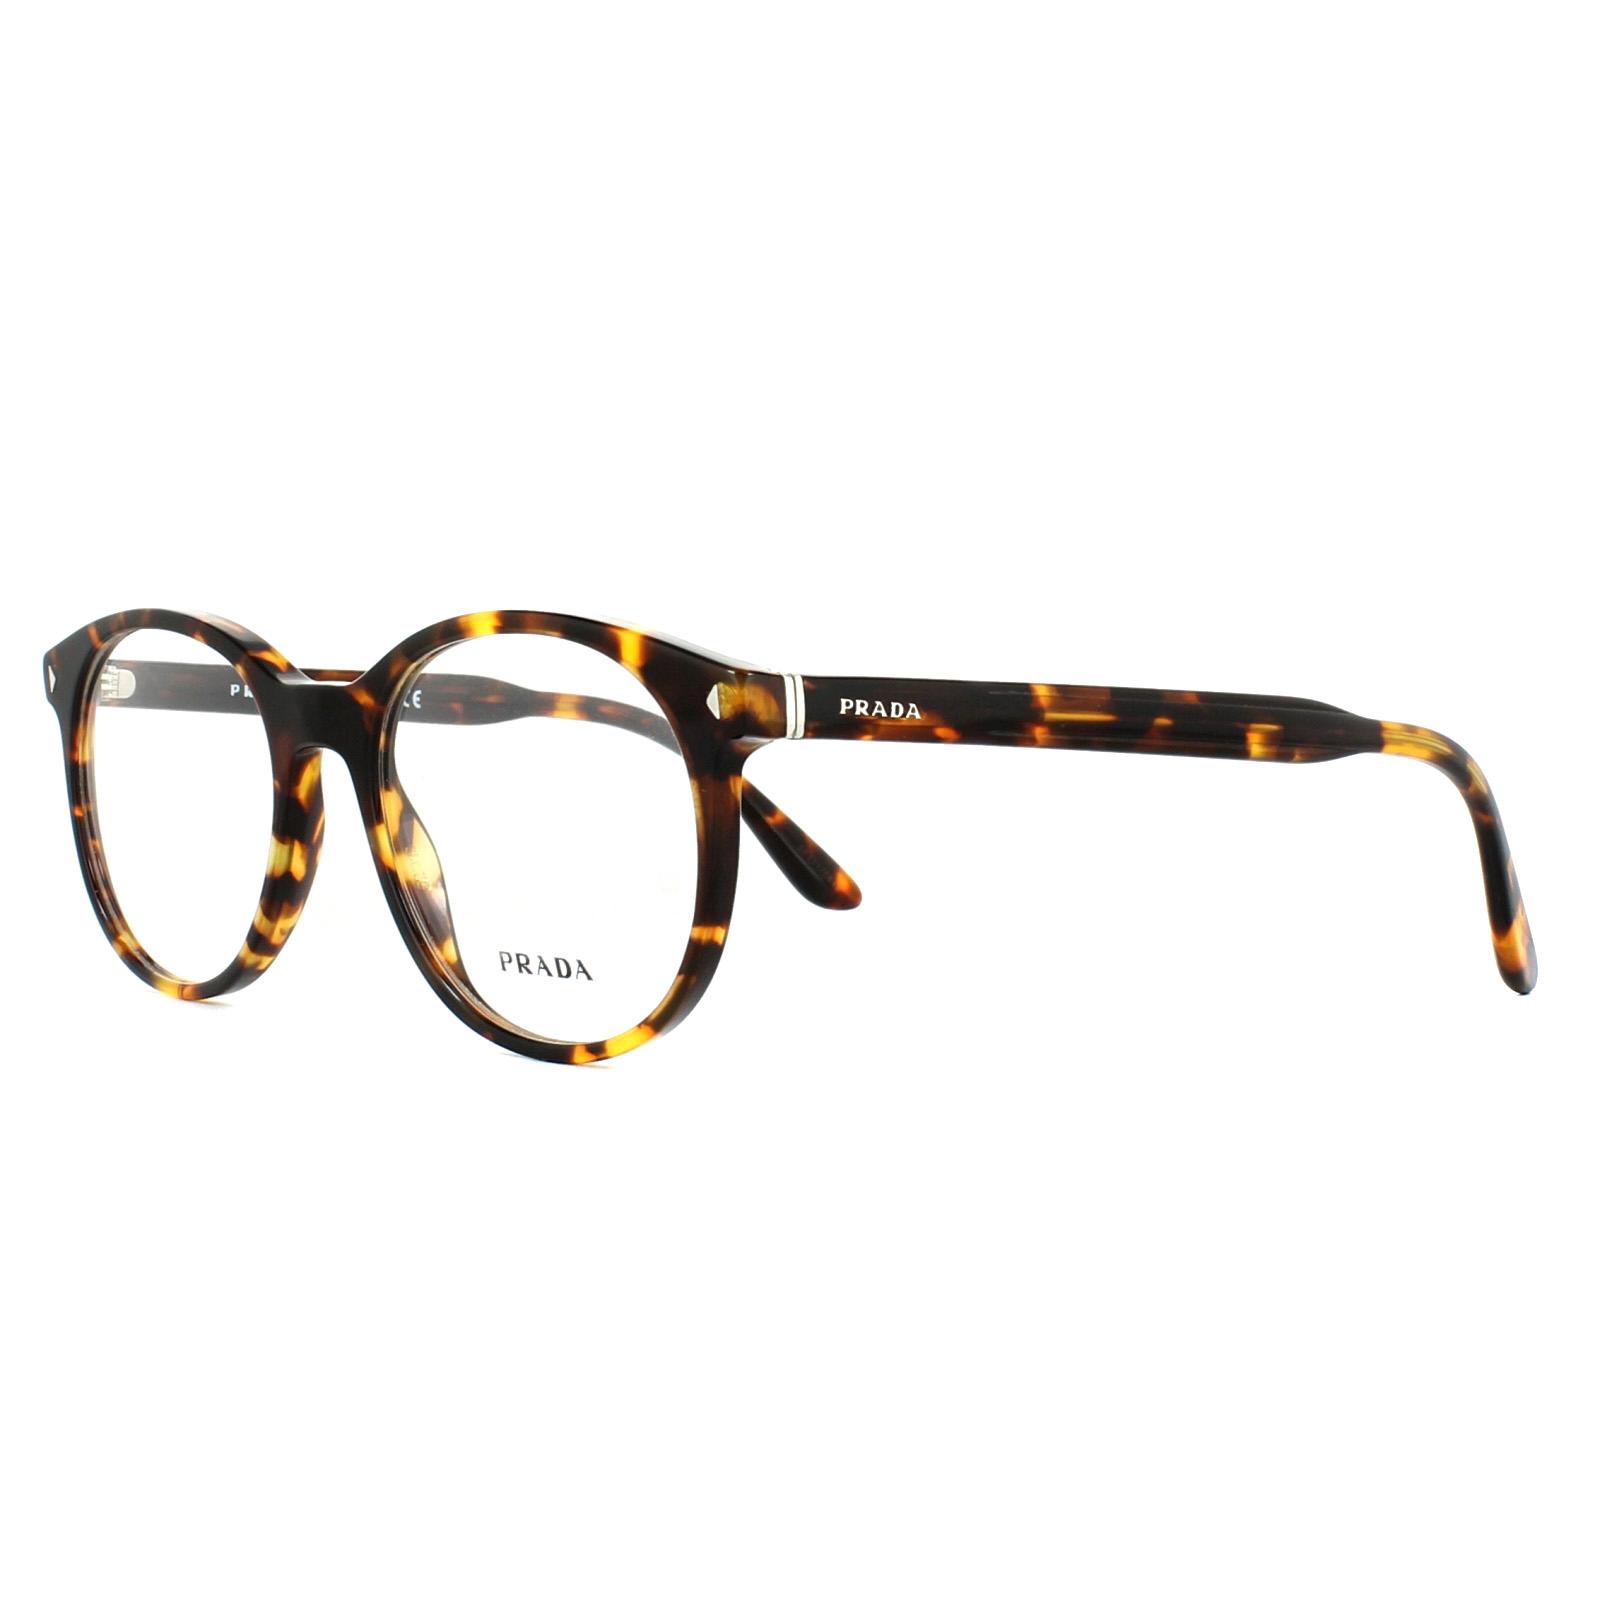 15b42ddfb8 Prada Glasses Frames PR14TV VAU1O1 Havana 52mm Mens 8053672674163